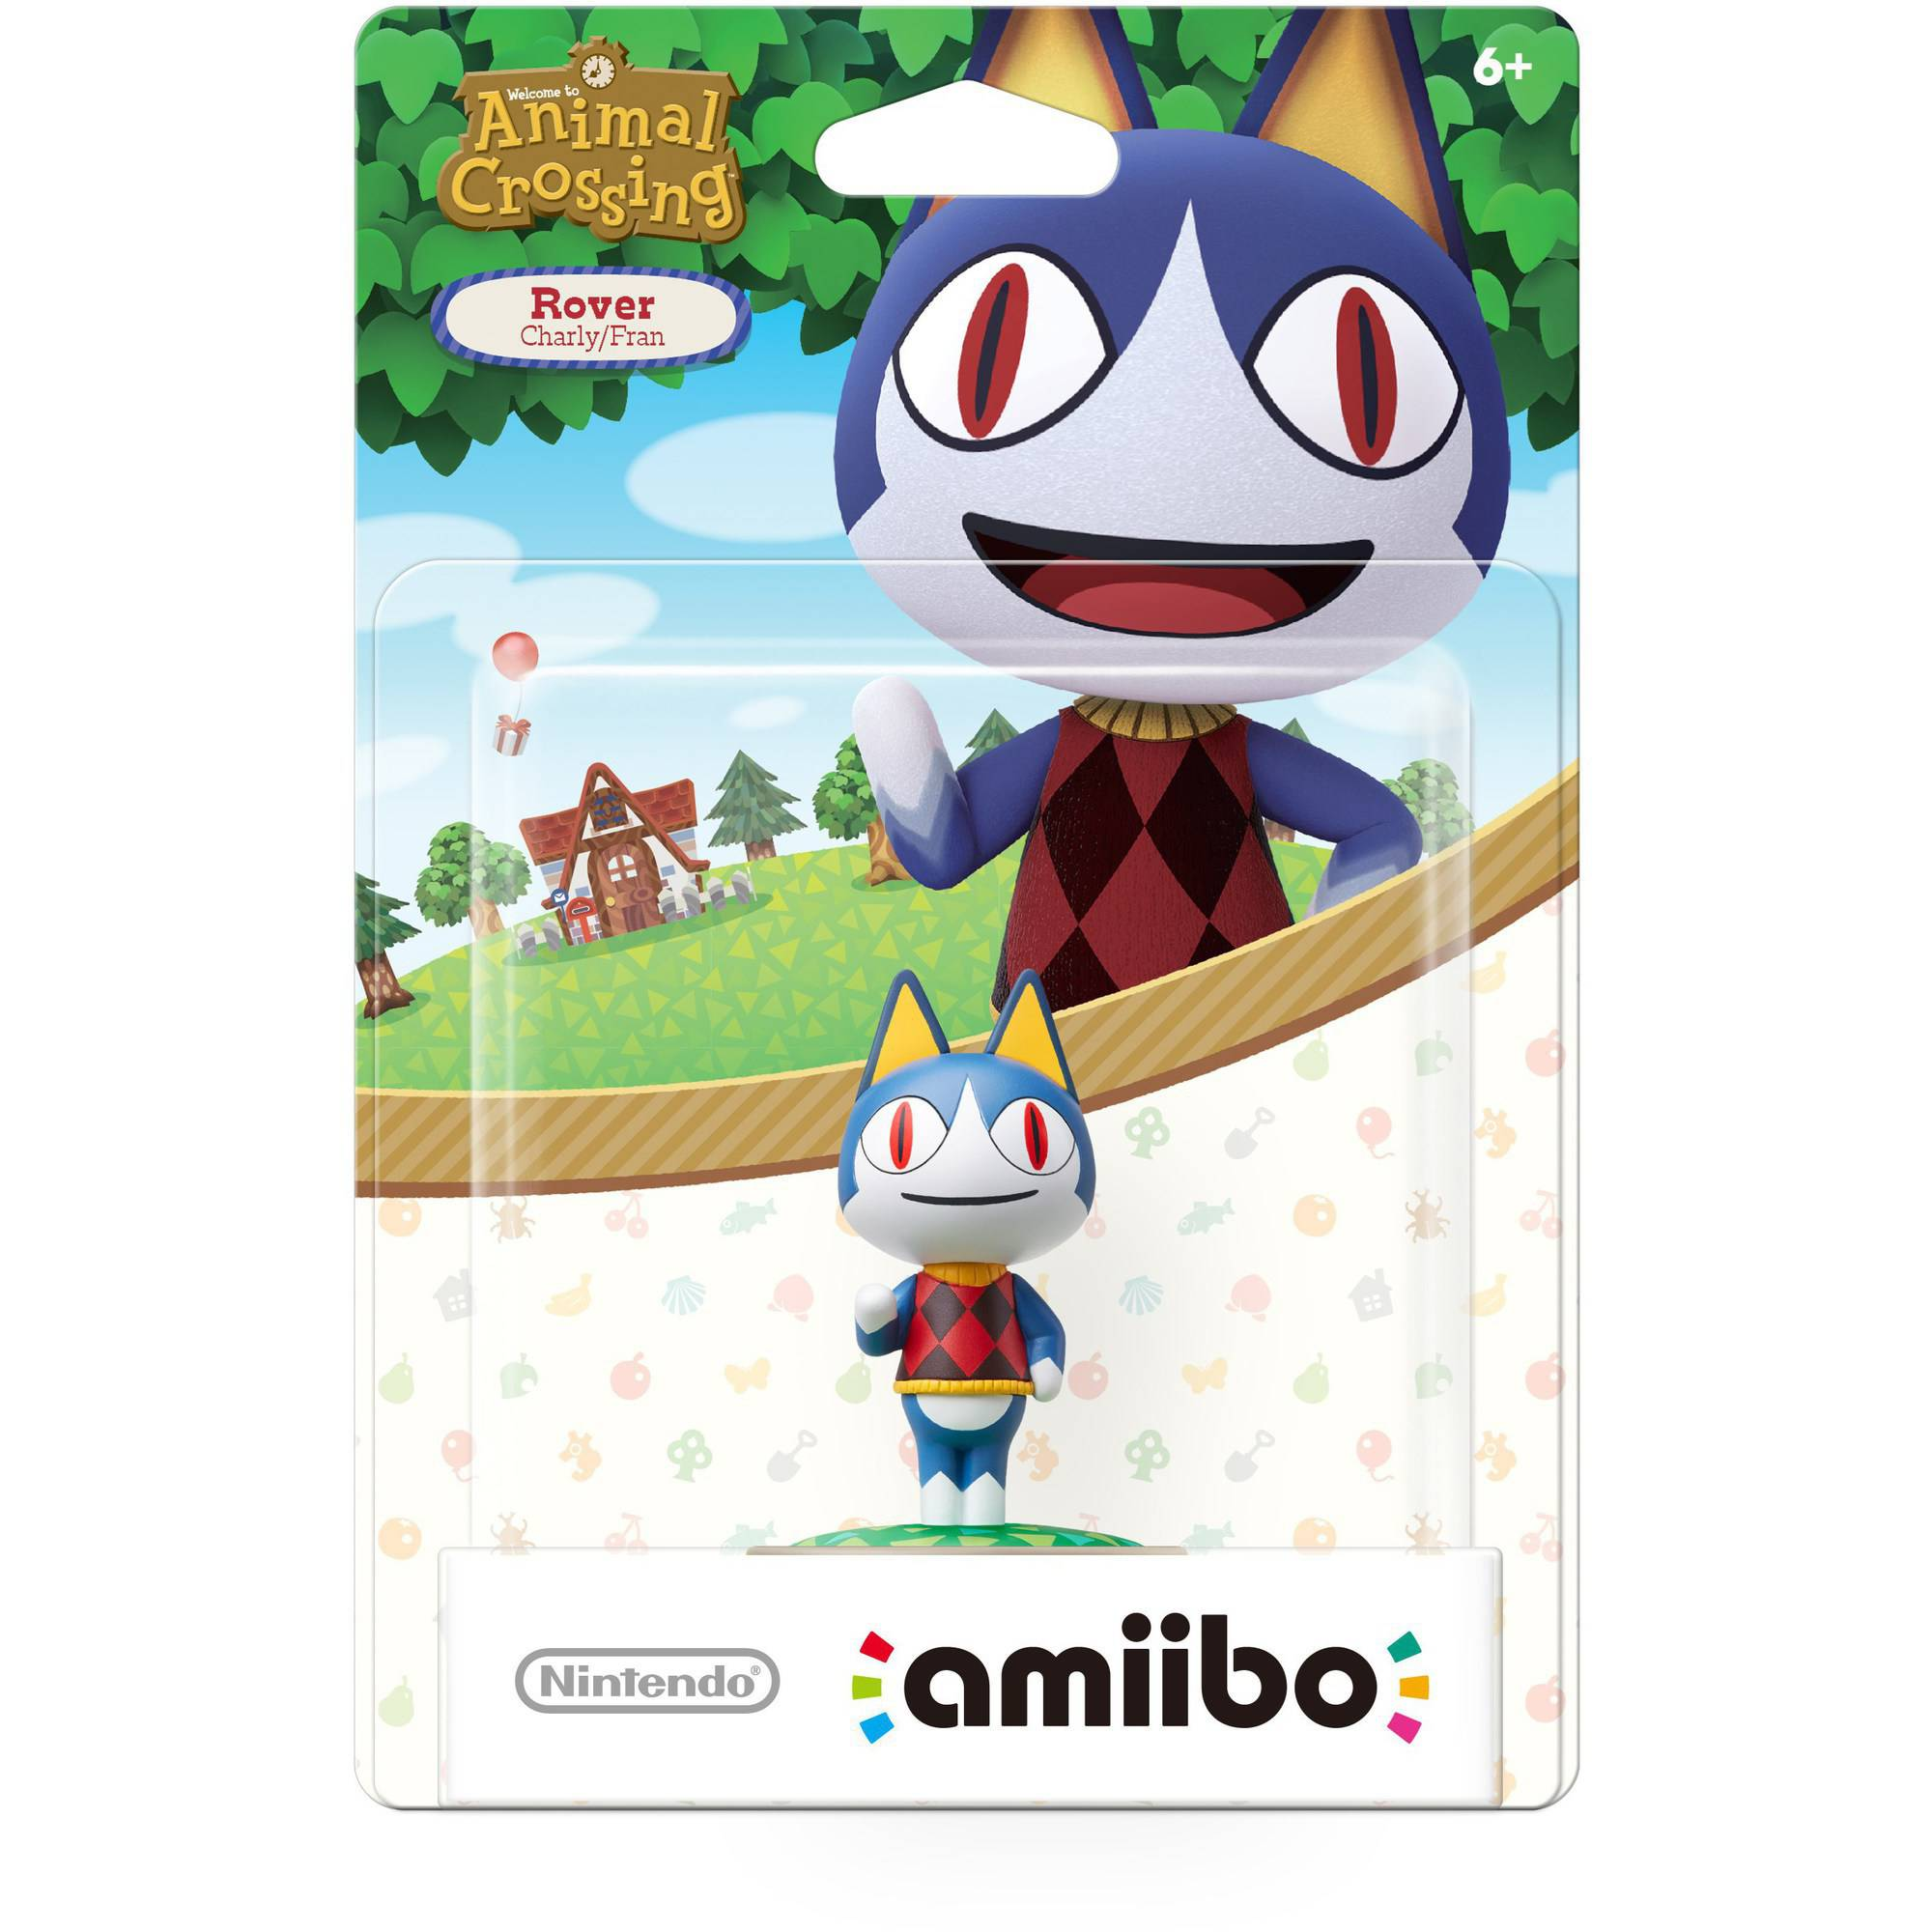 Rover, Animal Crossing Series, Nintendo amiibo, NVLCAJAP